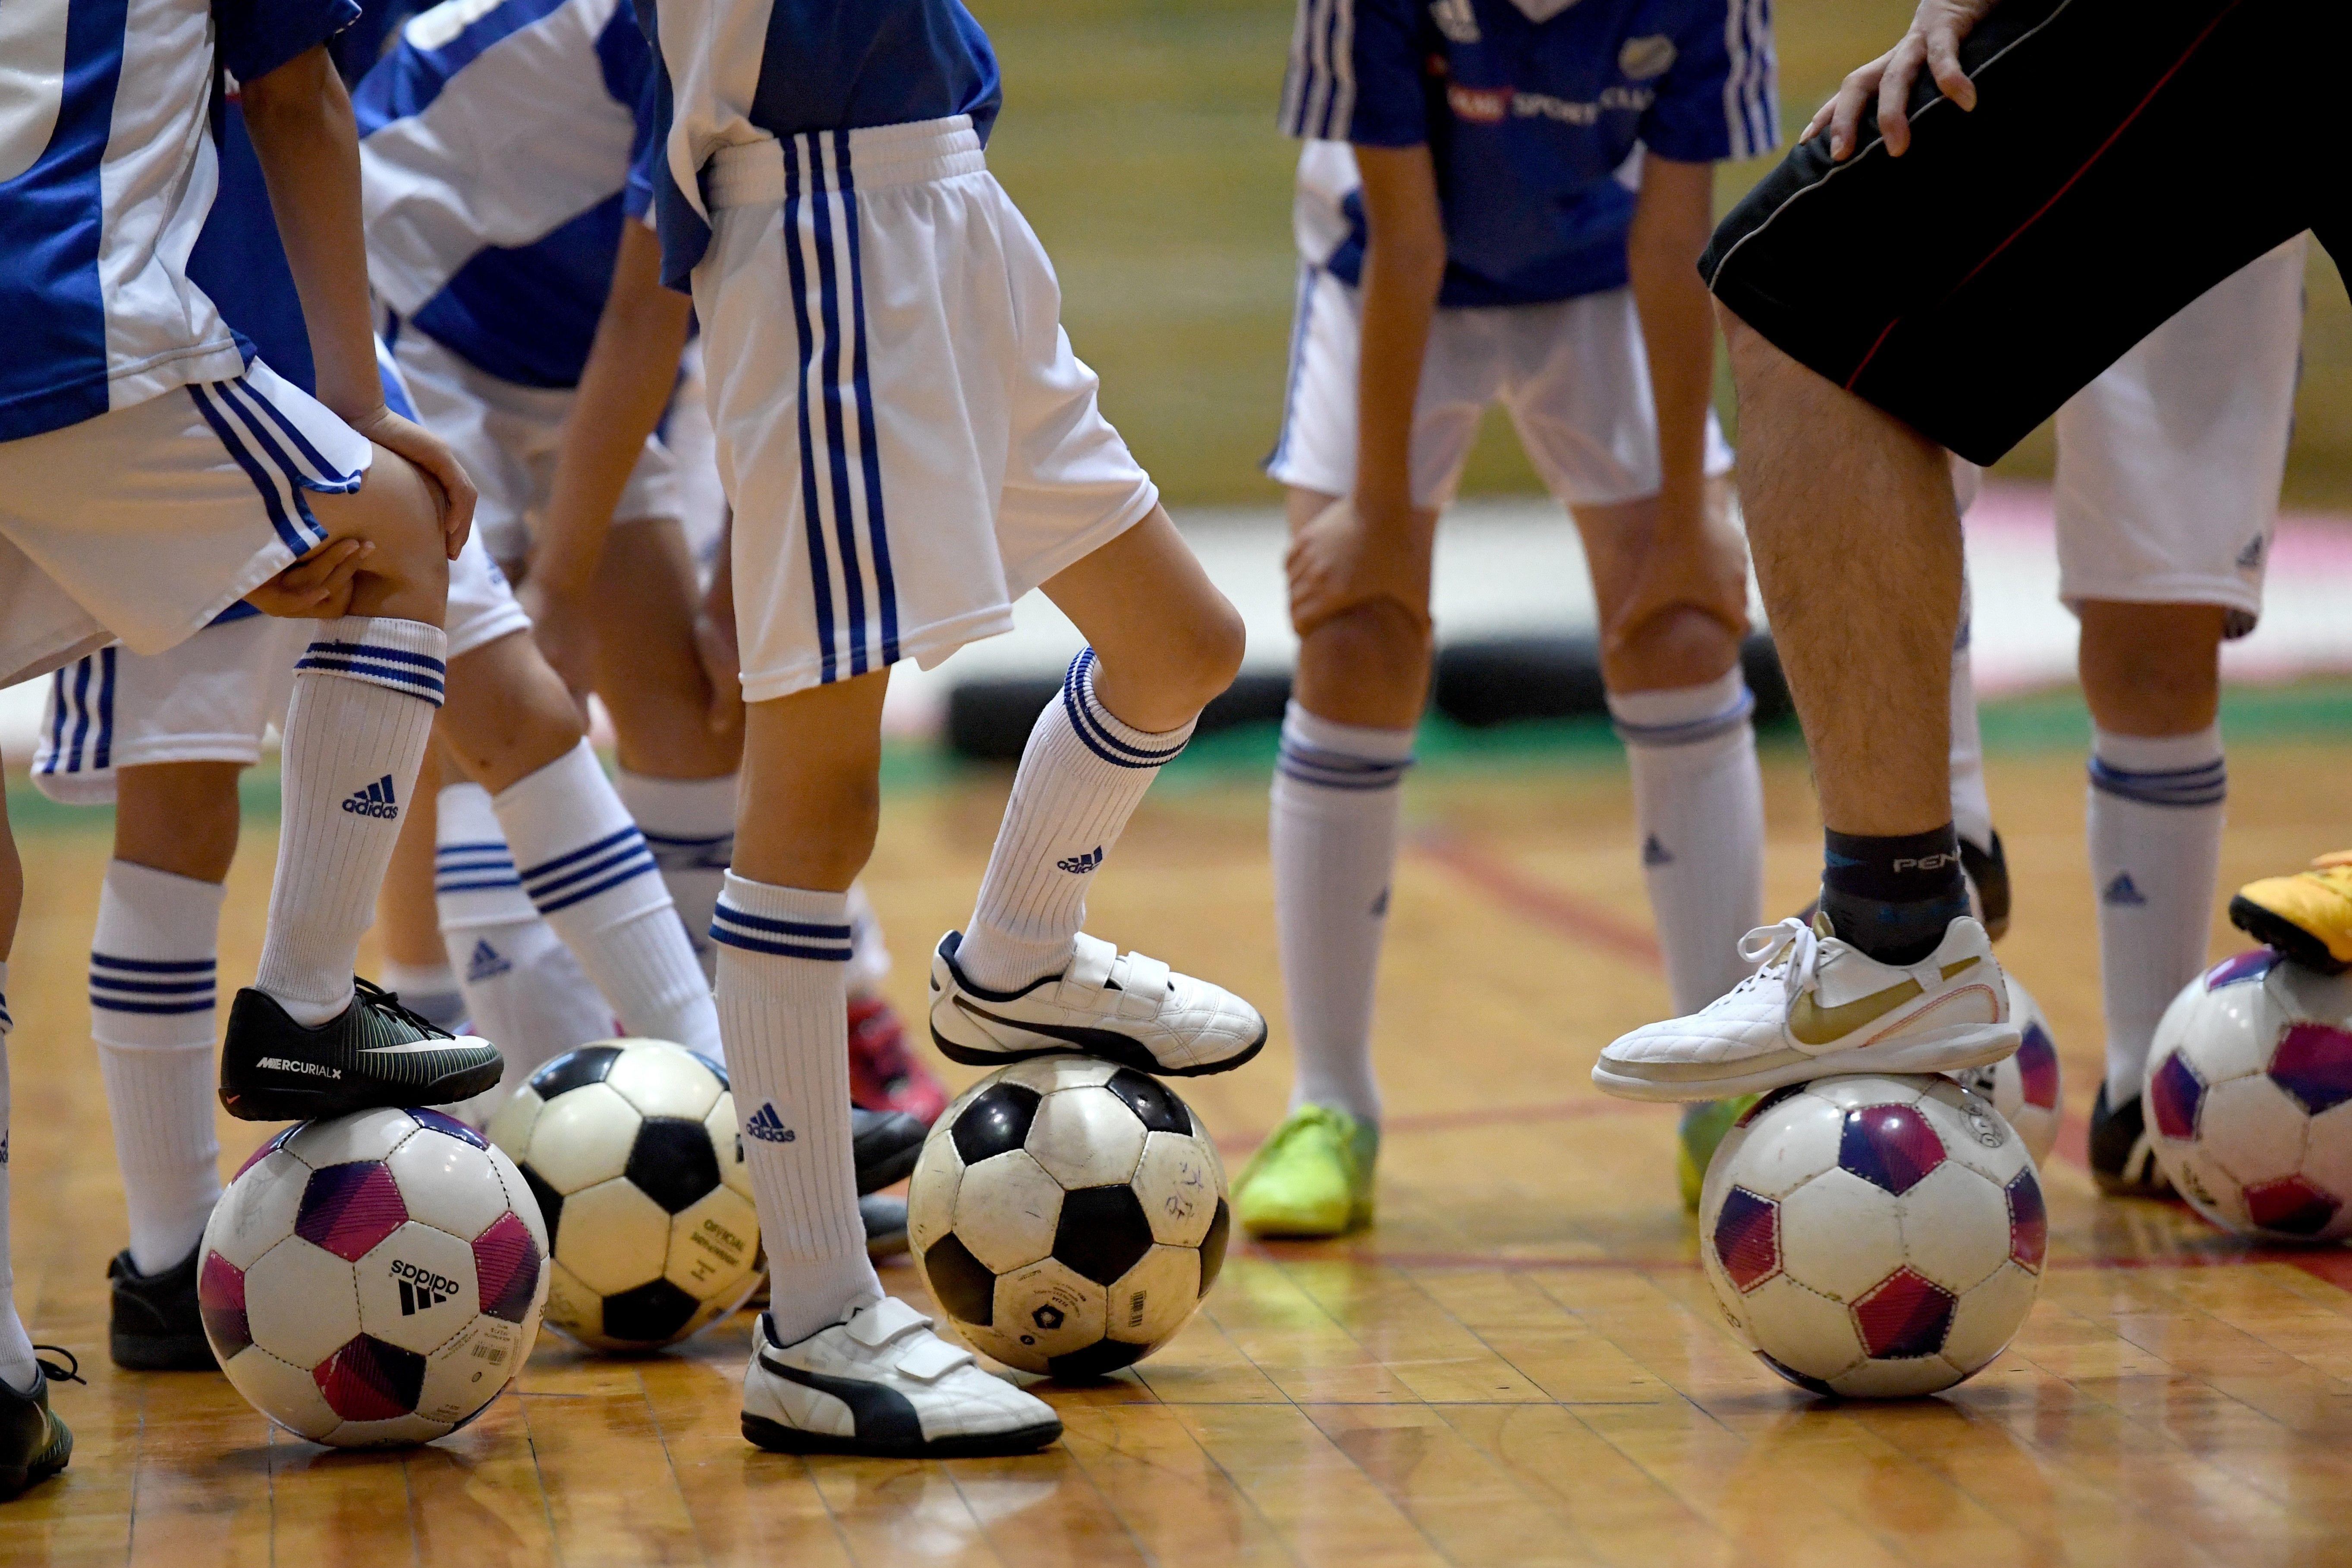 Elementary school children attending a kids soccer school class at Konami Sports Club headquarters in Tokyo.